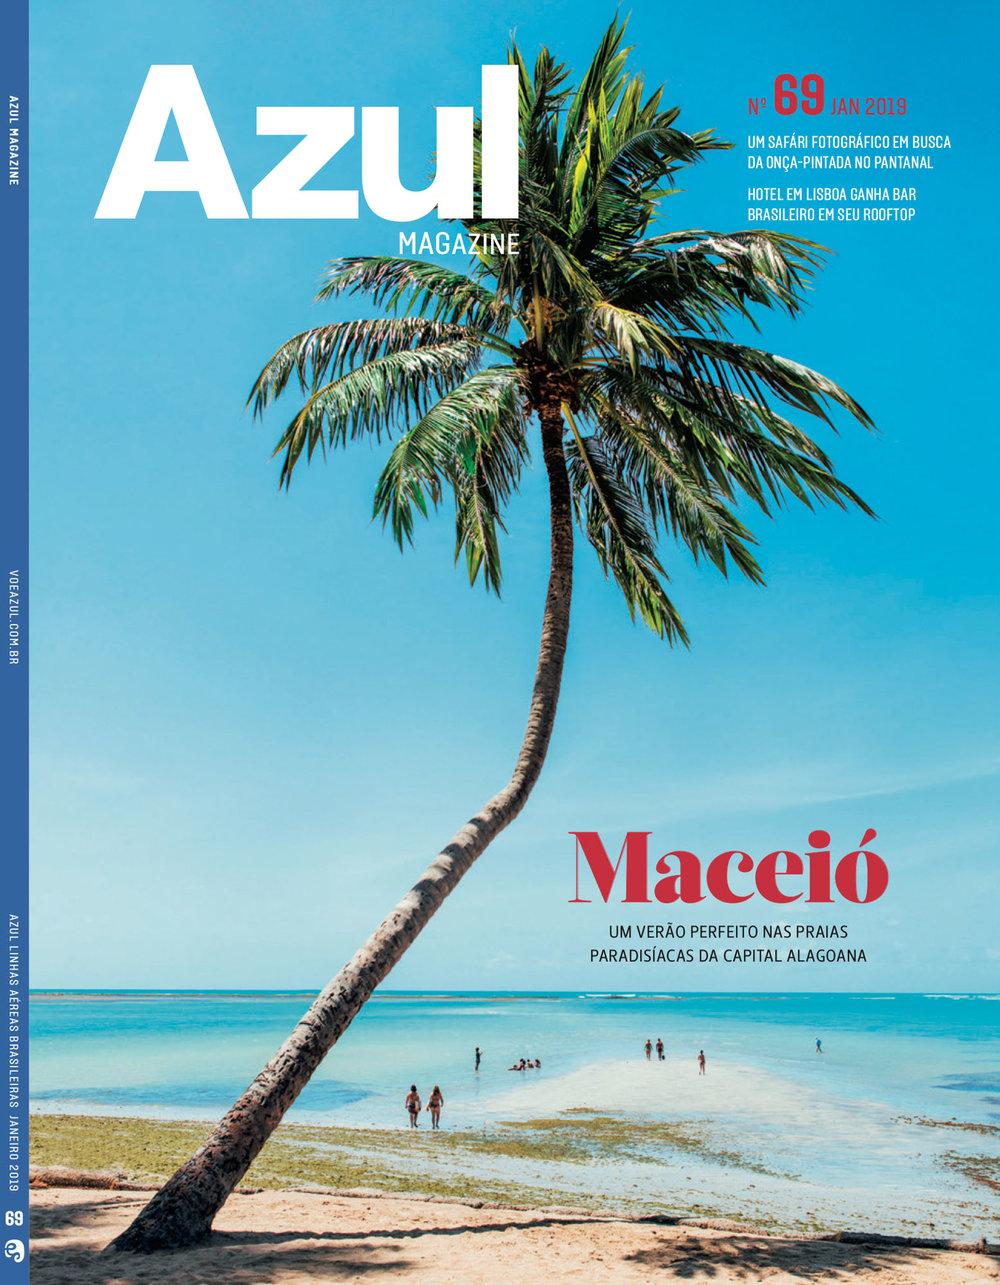 Angelo Dal Bo_AZUL MAGAZINE-25.jpg